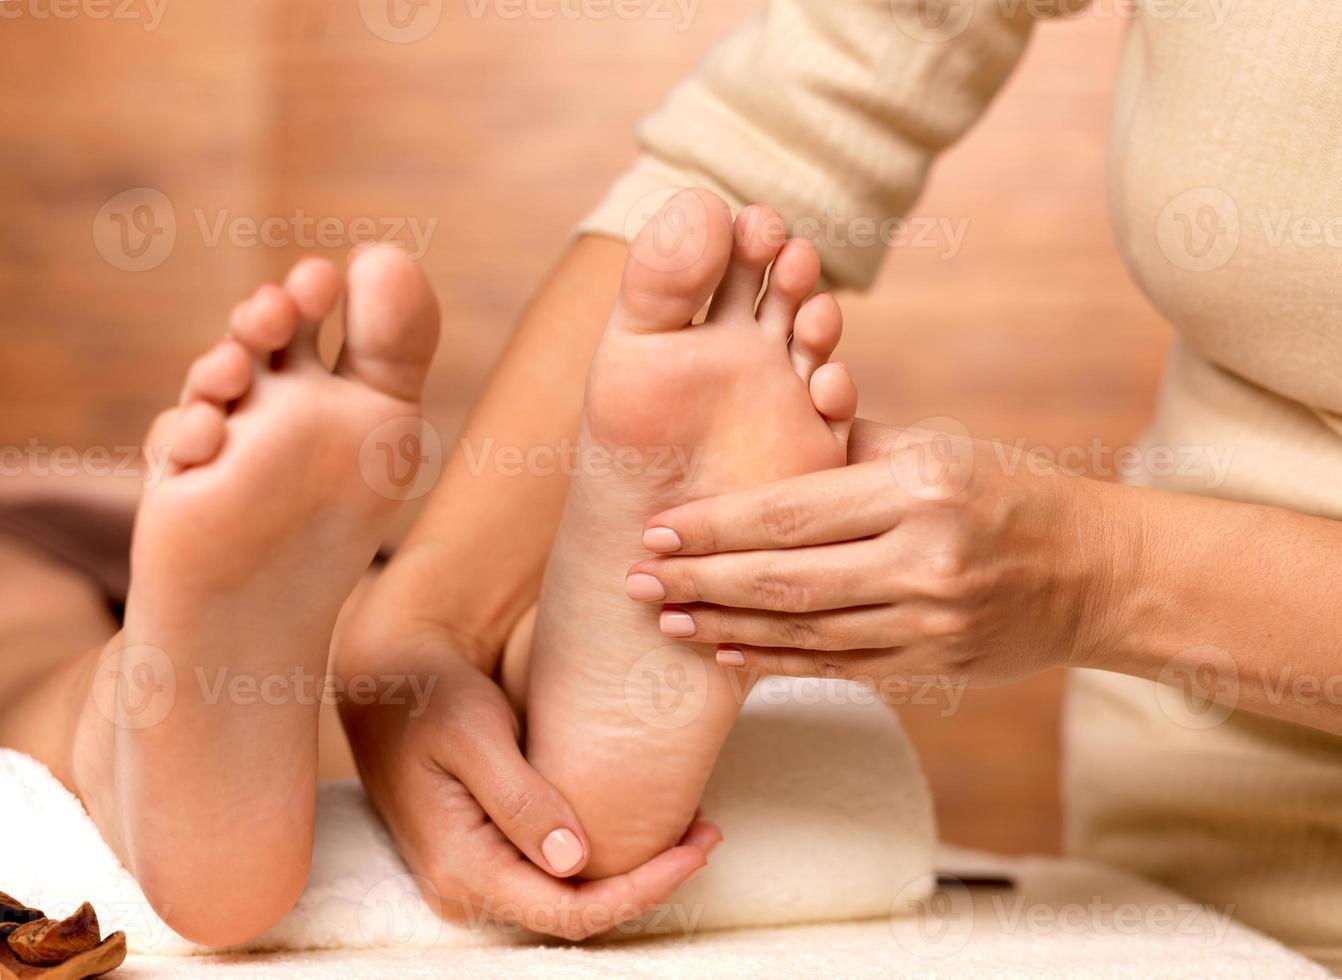 Massage of human foot in spa salon photo